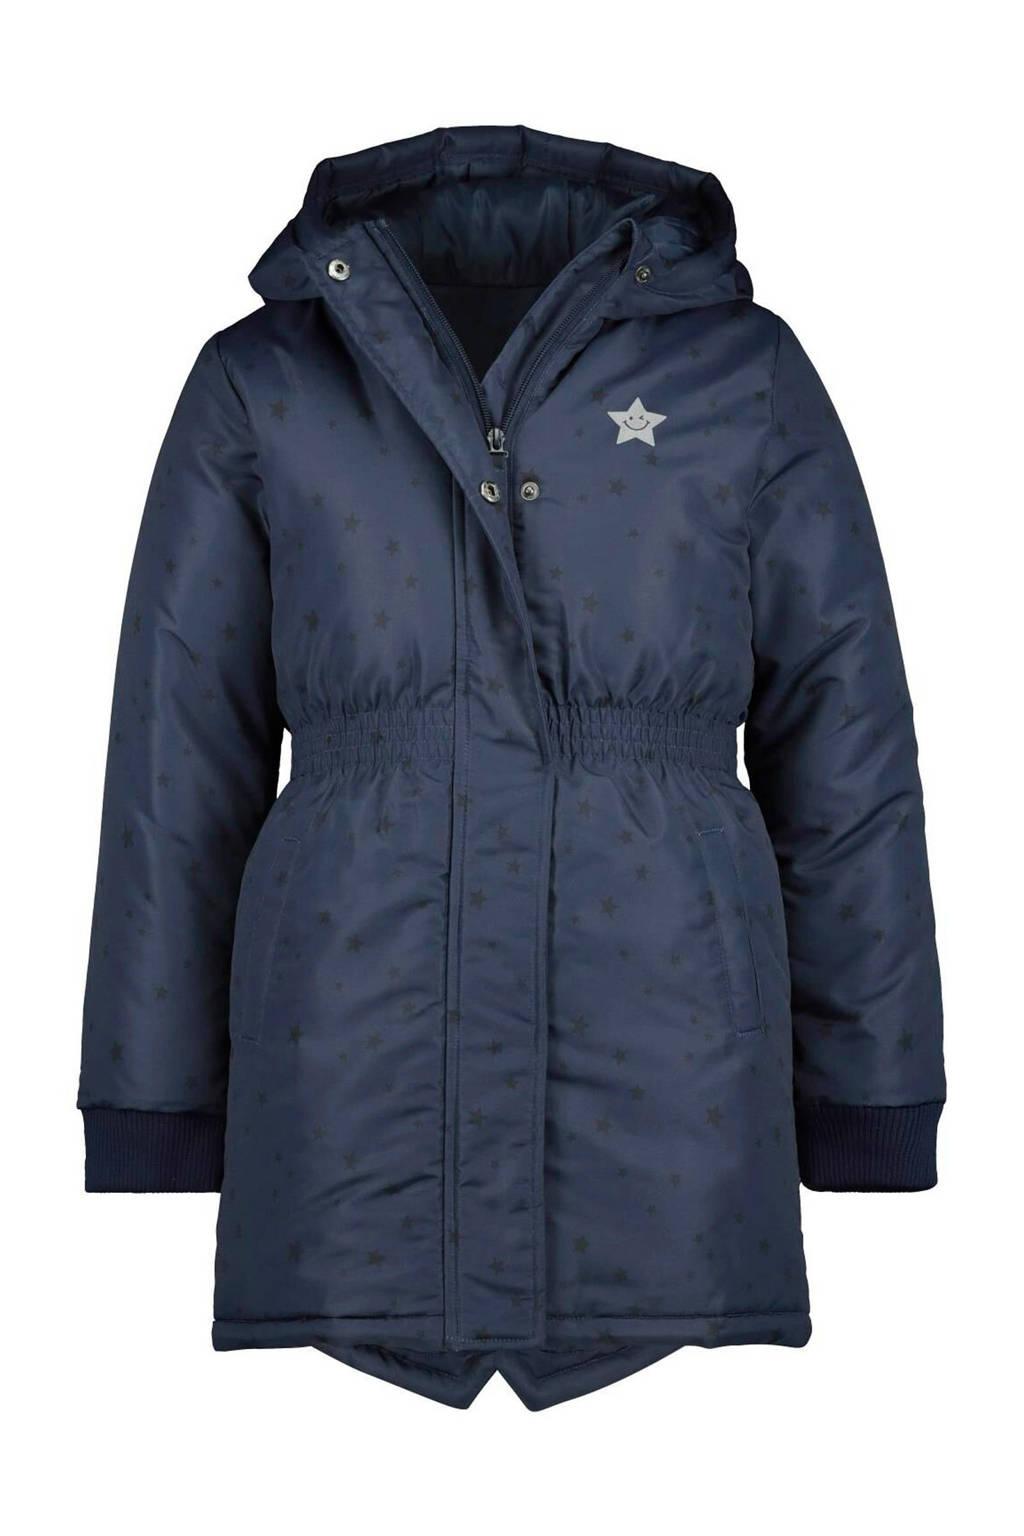 HEMA winterjas met sterren donkerblauw, Donkerblauw